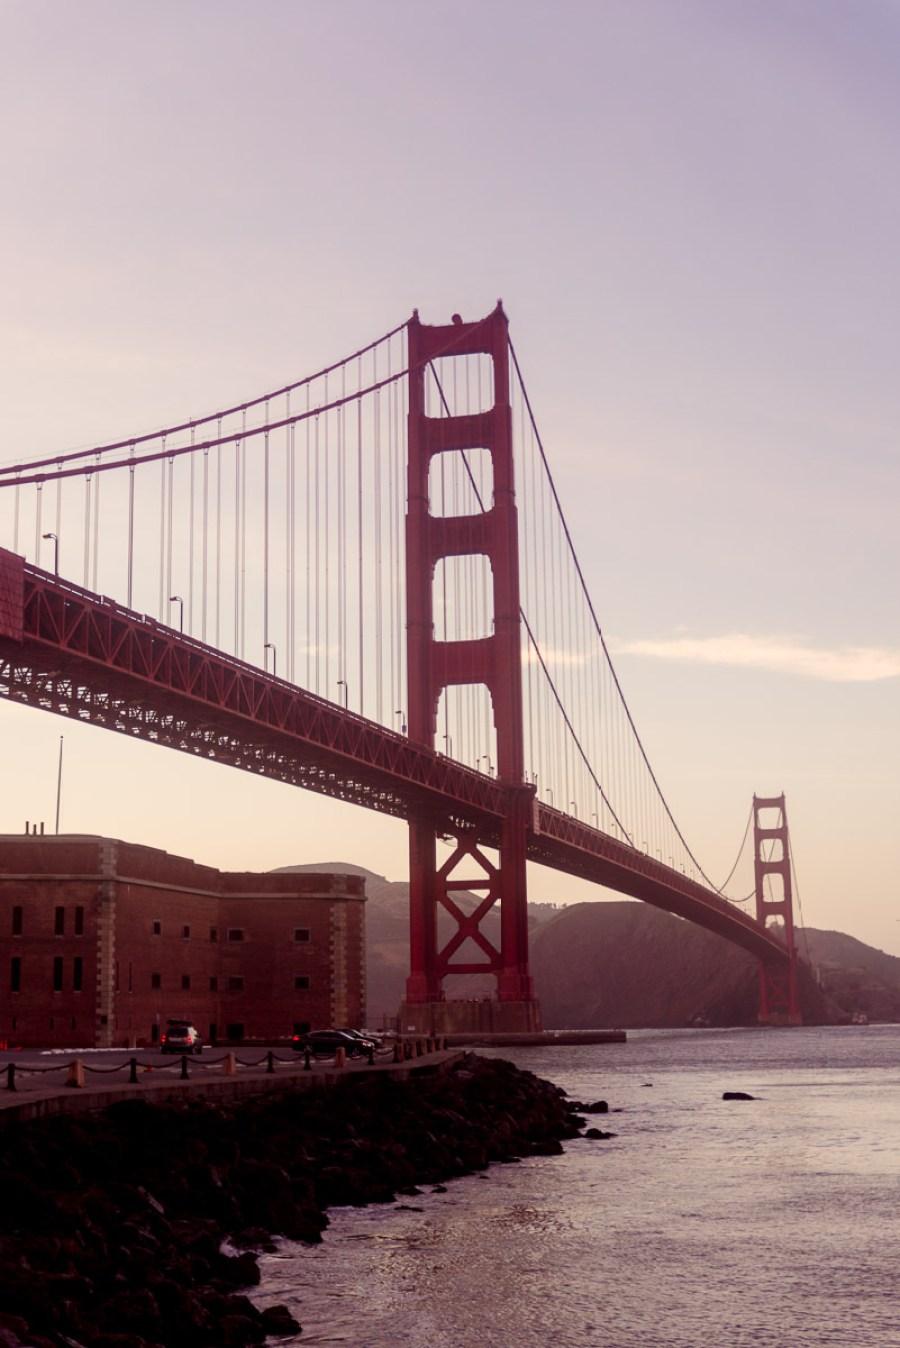 San Francisco 2016 U.S.A. America Holidays-33